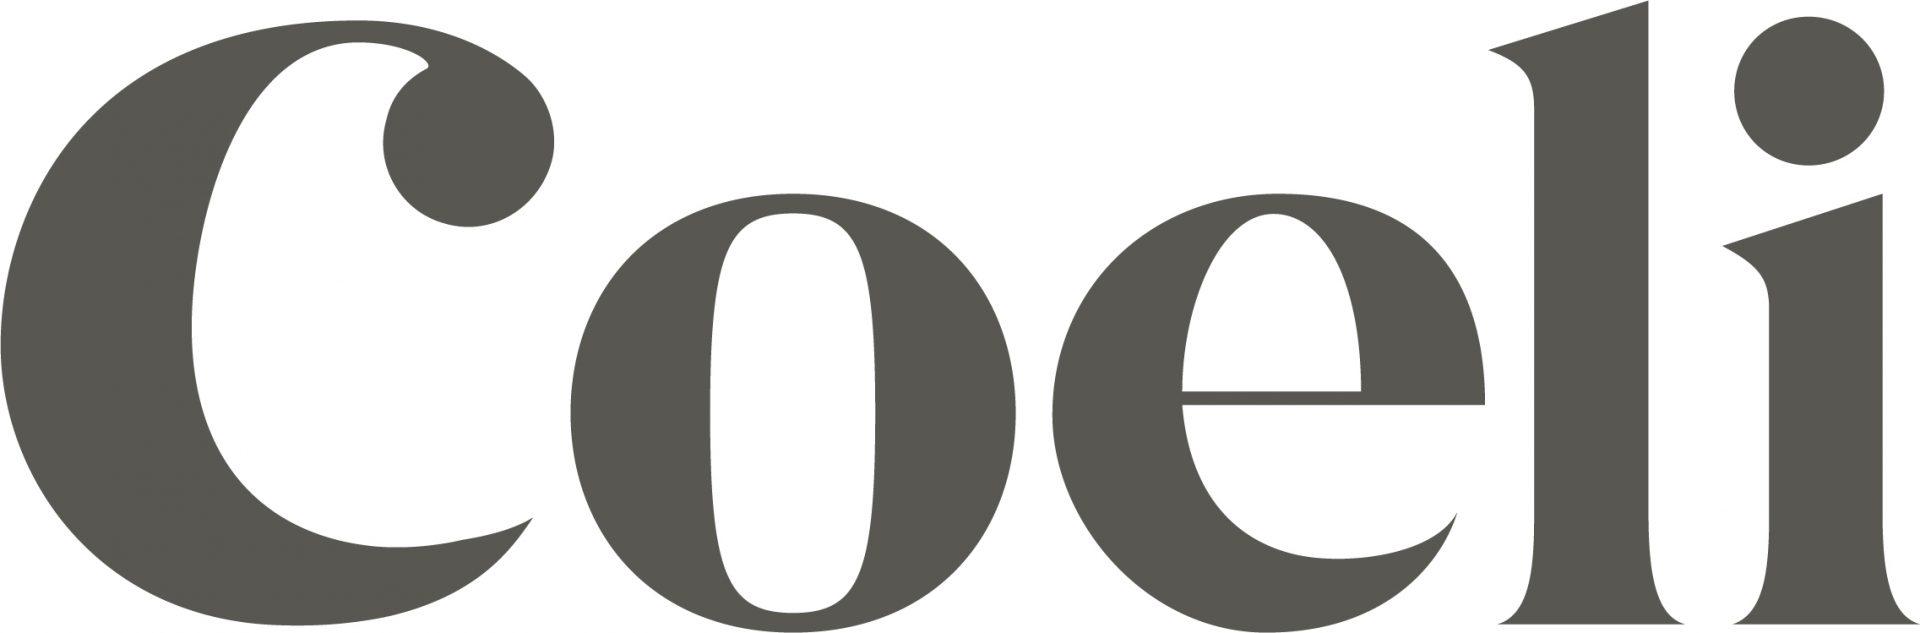 coeli_logo